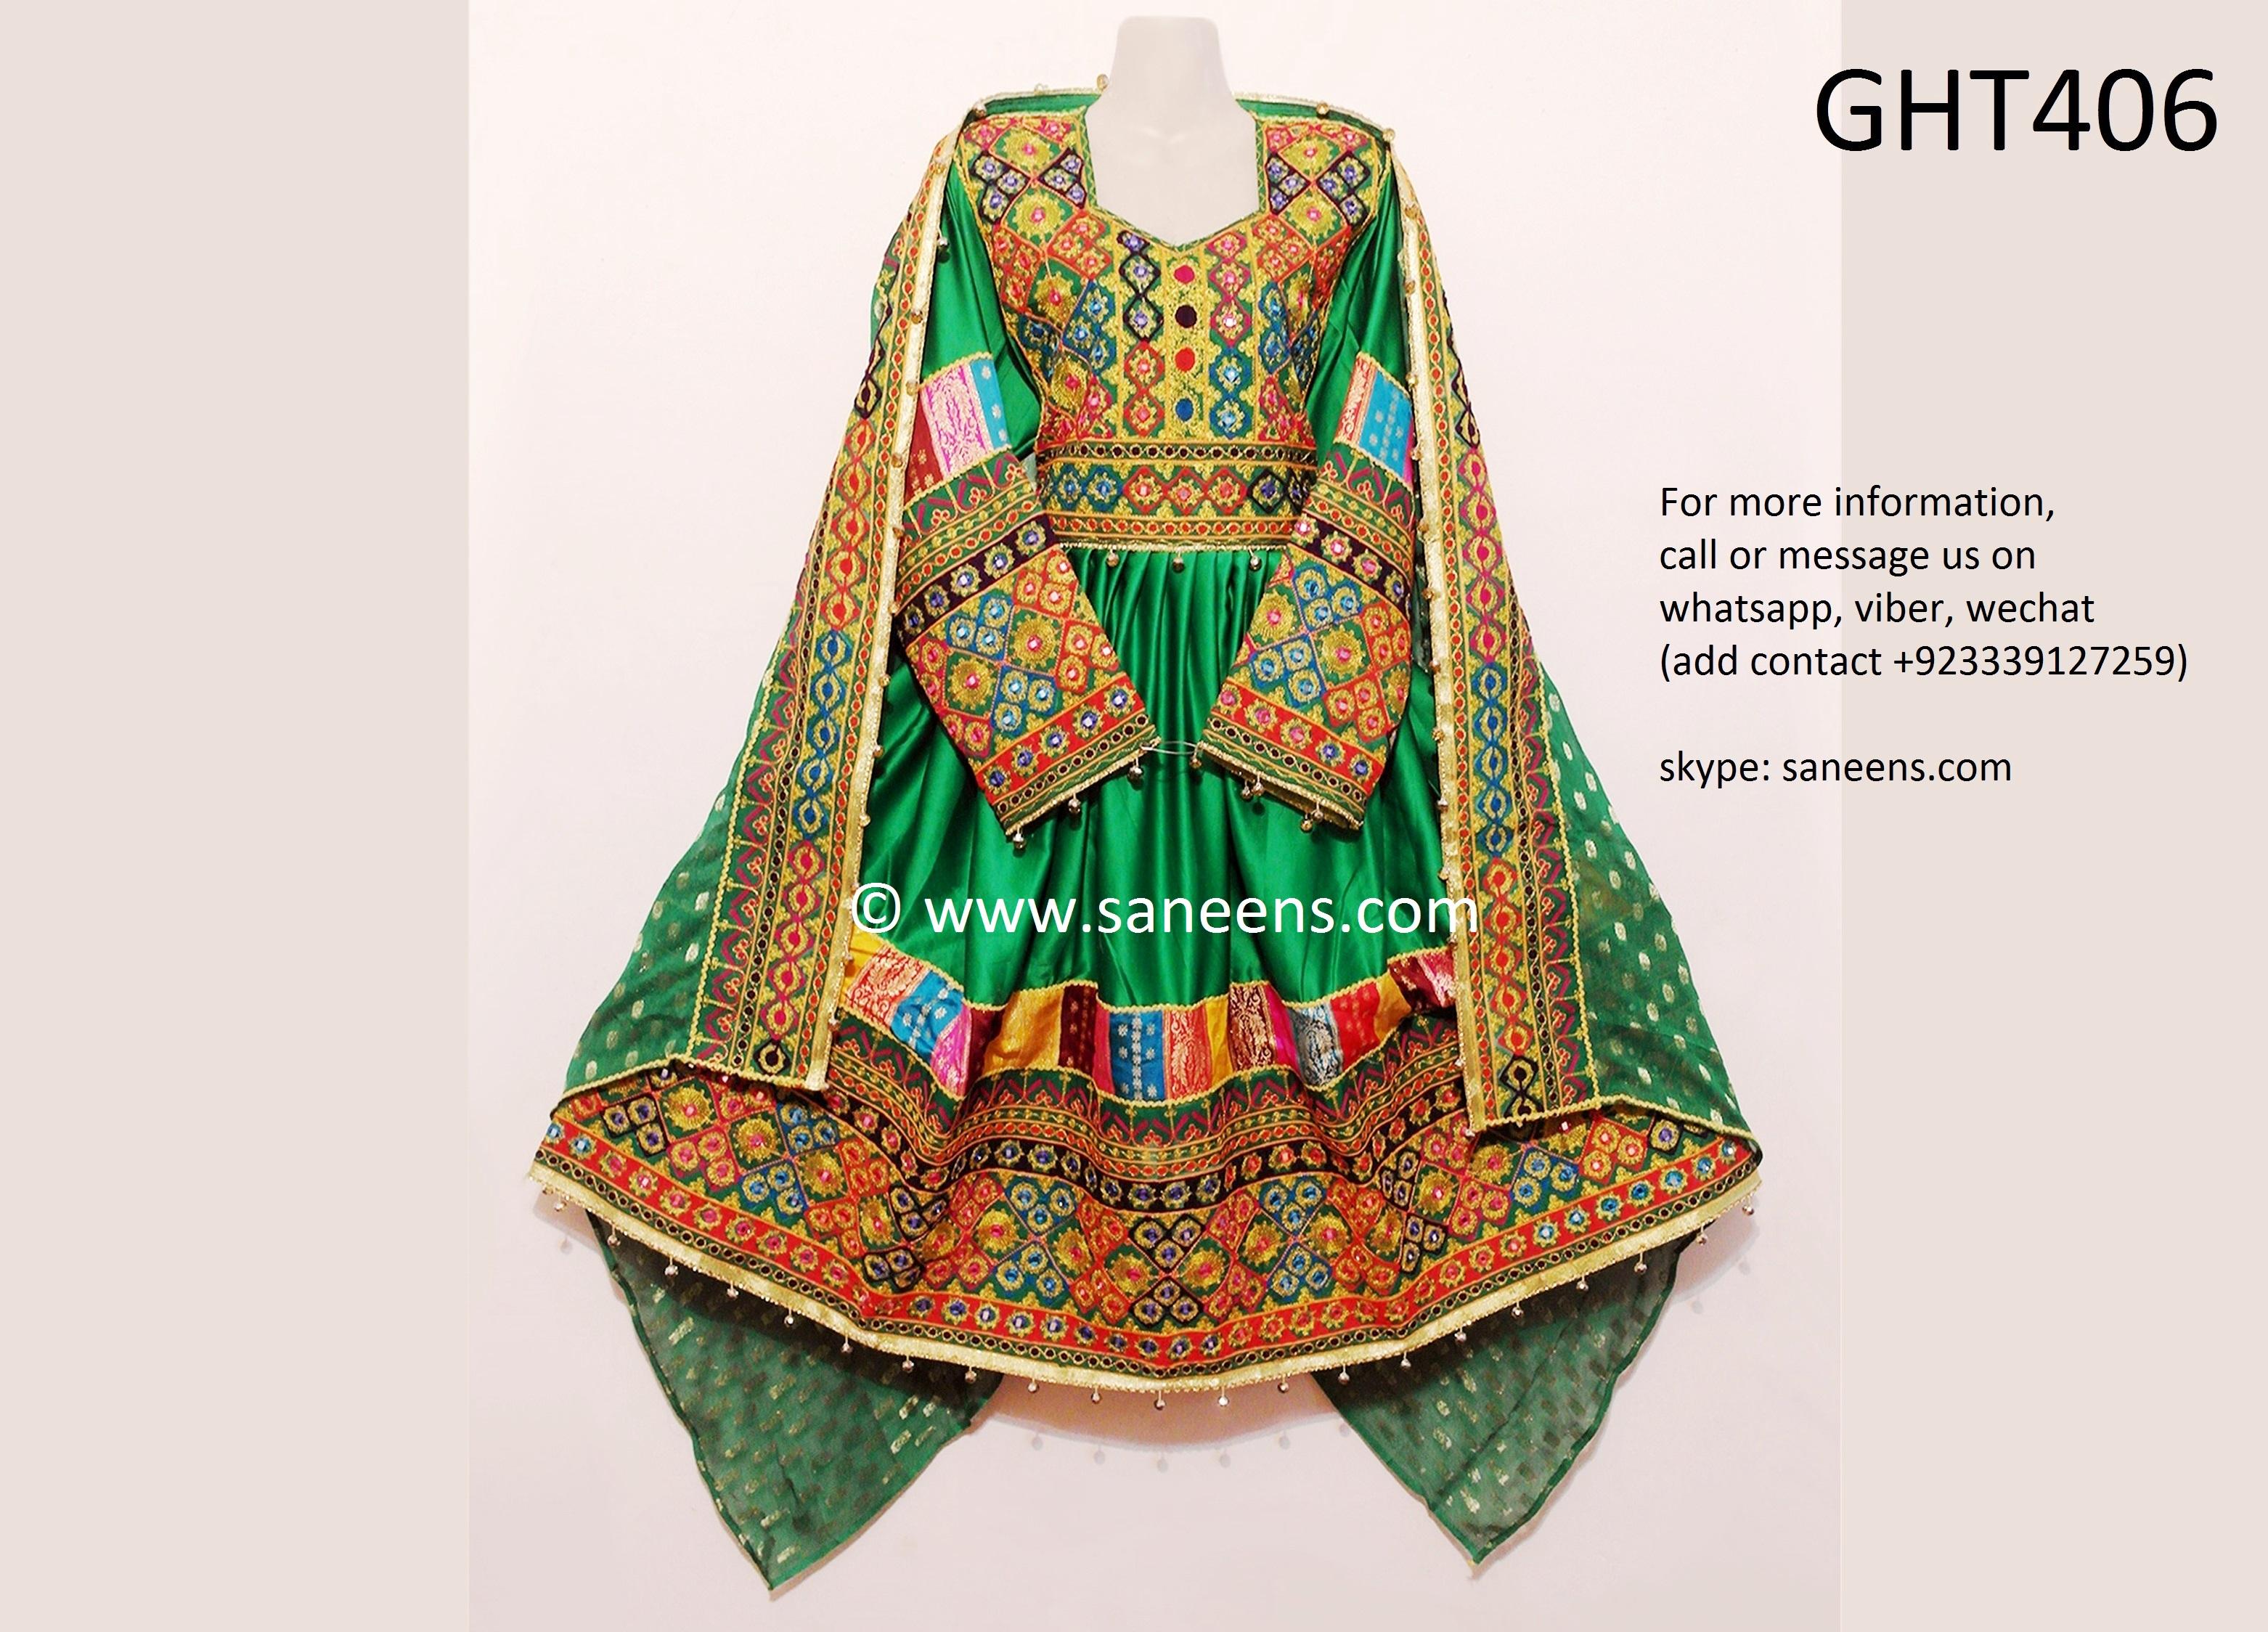 ght406-1-b.jpg